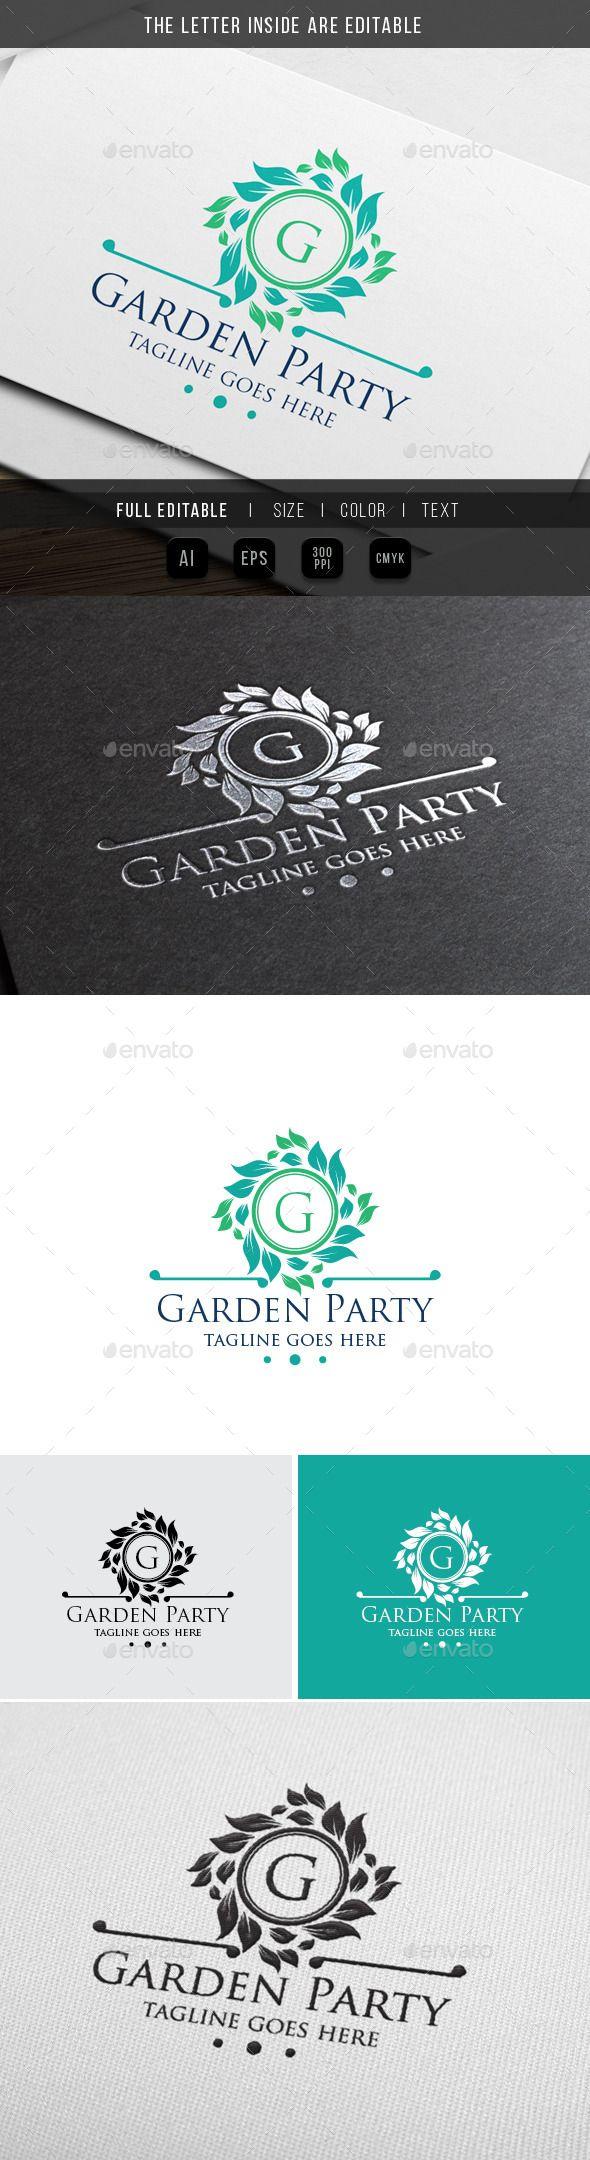 Luxury Garden - Classy Party Template #design Download: http://graphicriver.net/item/luxury-garden-classy-party/9994133?ref=ksioks